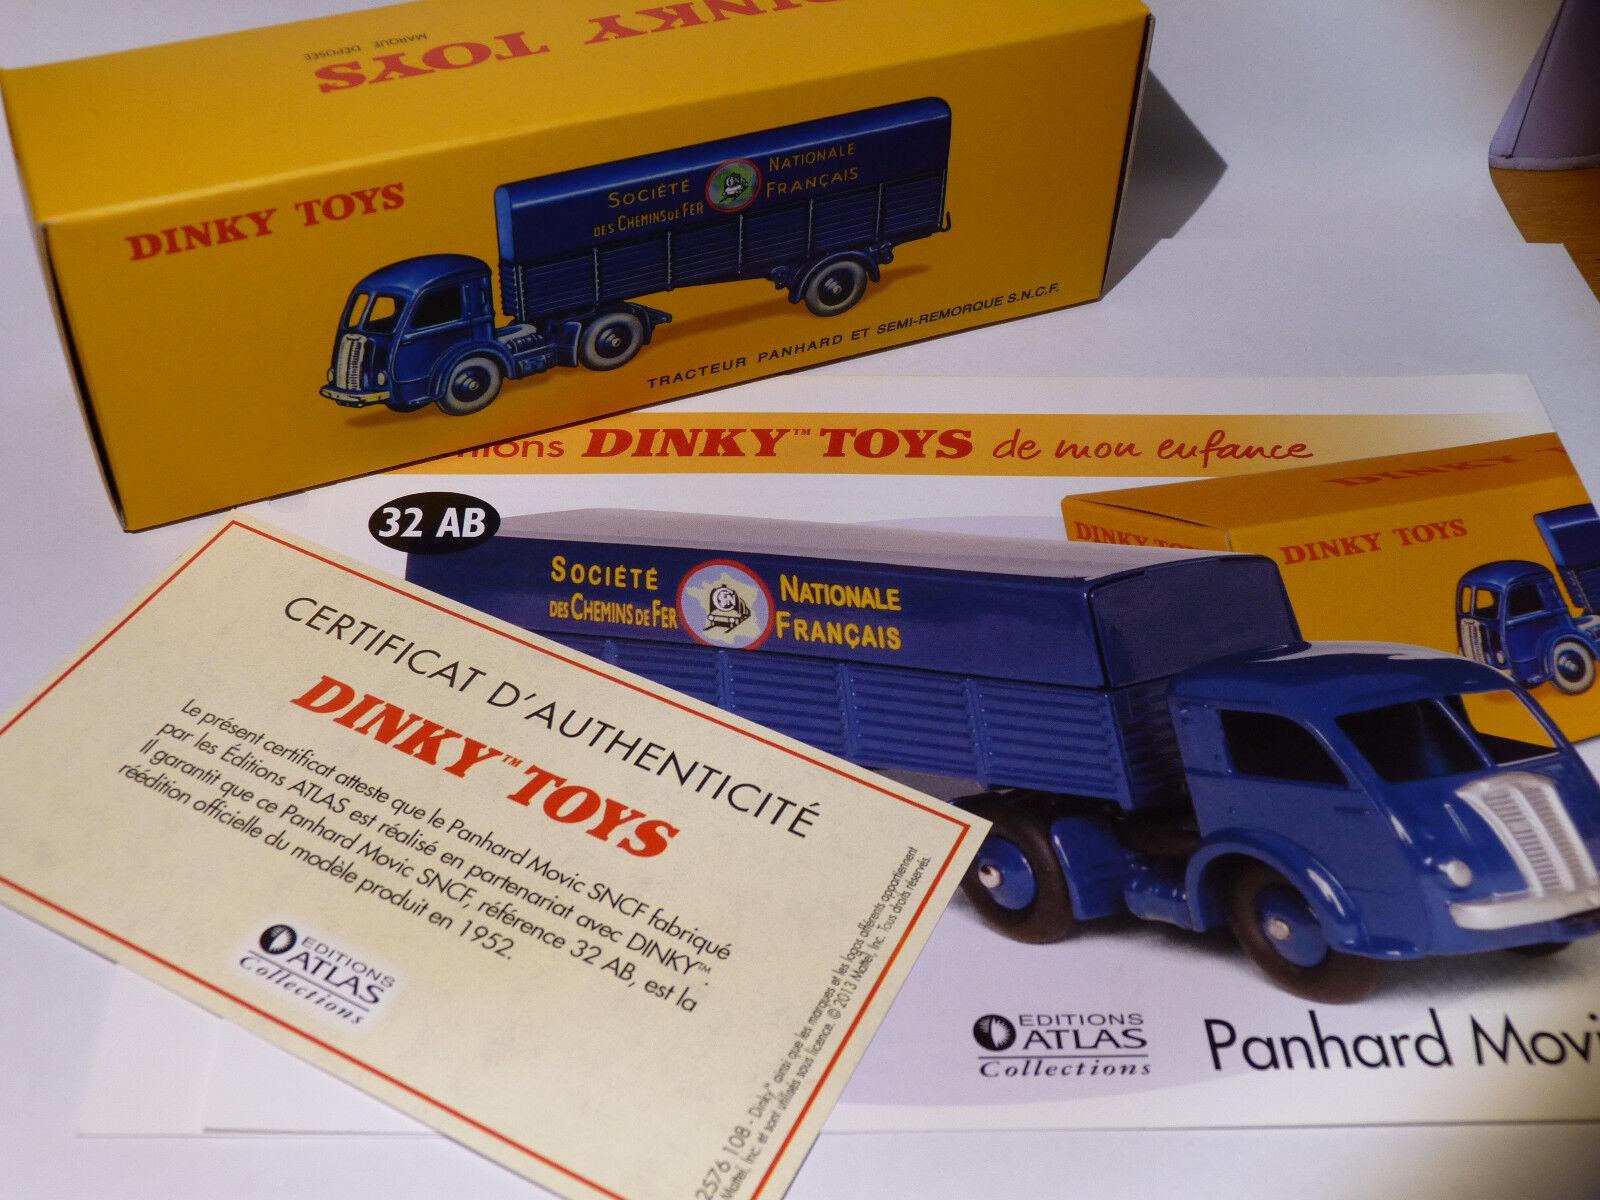 Camion Panhard + semi-remorque SNCF - ref 32 AB   32AB de dinky toys atlas